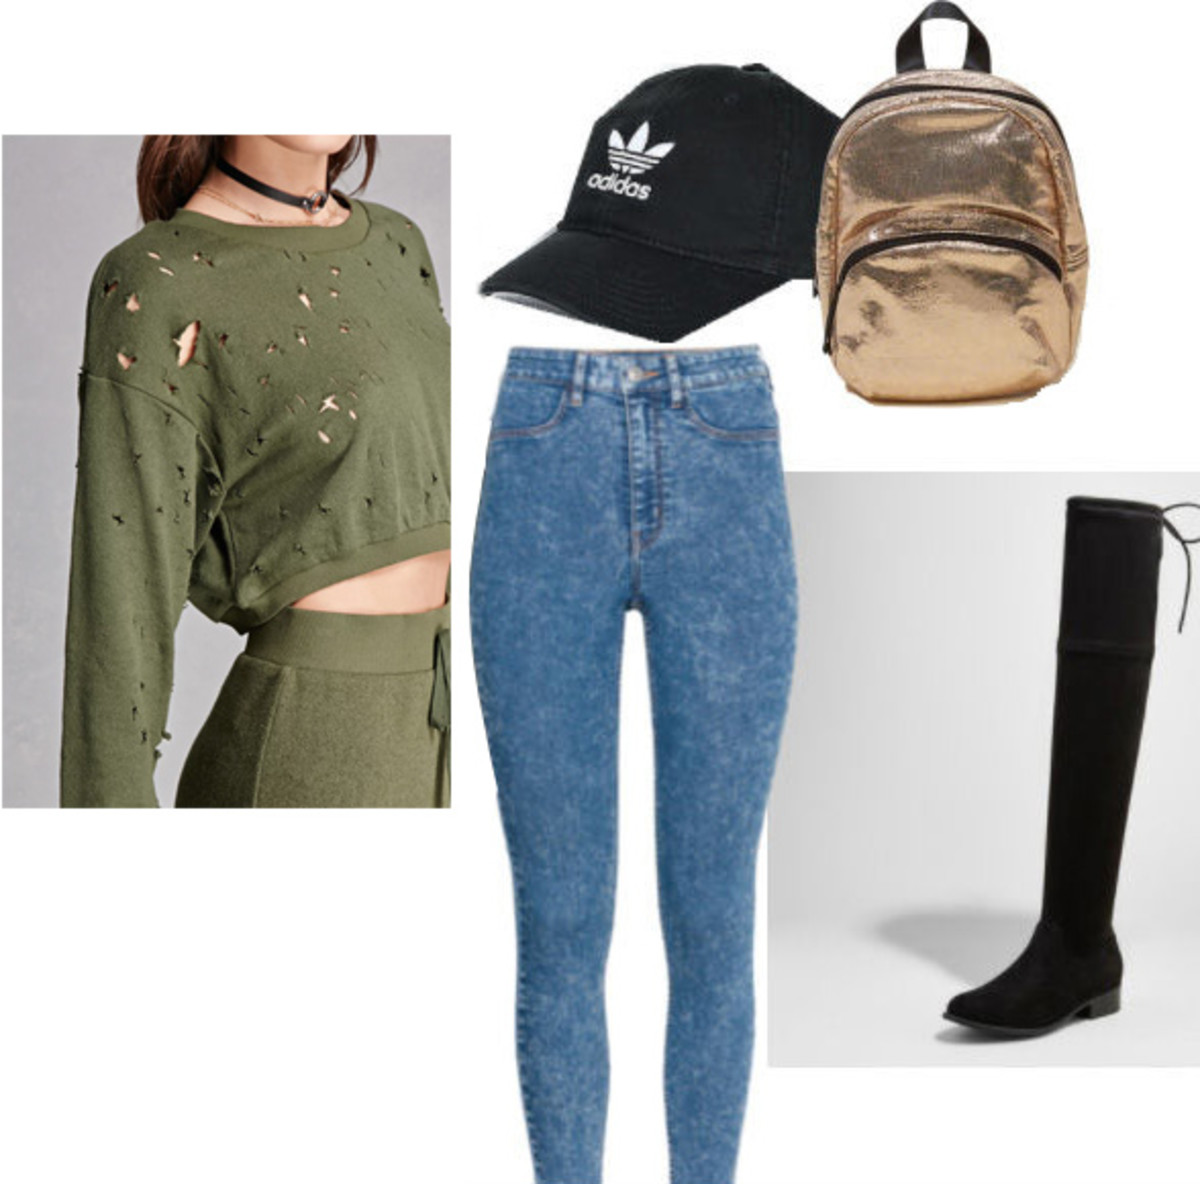 blue-med-skinny-jeans-black-shoe-boots-tan-bag-pack-hat-cap-green-olive-sweater-sweatshirt-fall-winter-weekend.jpg